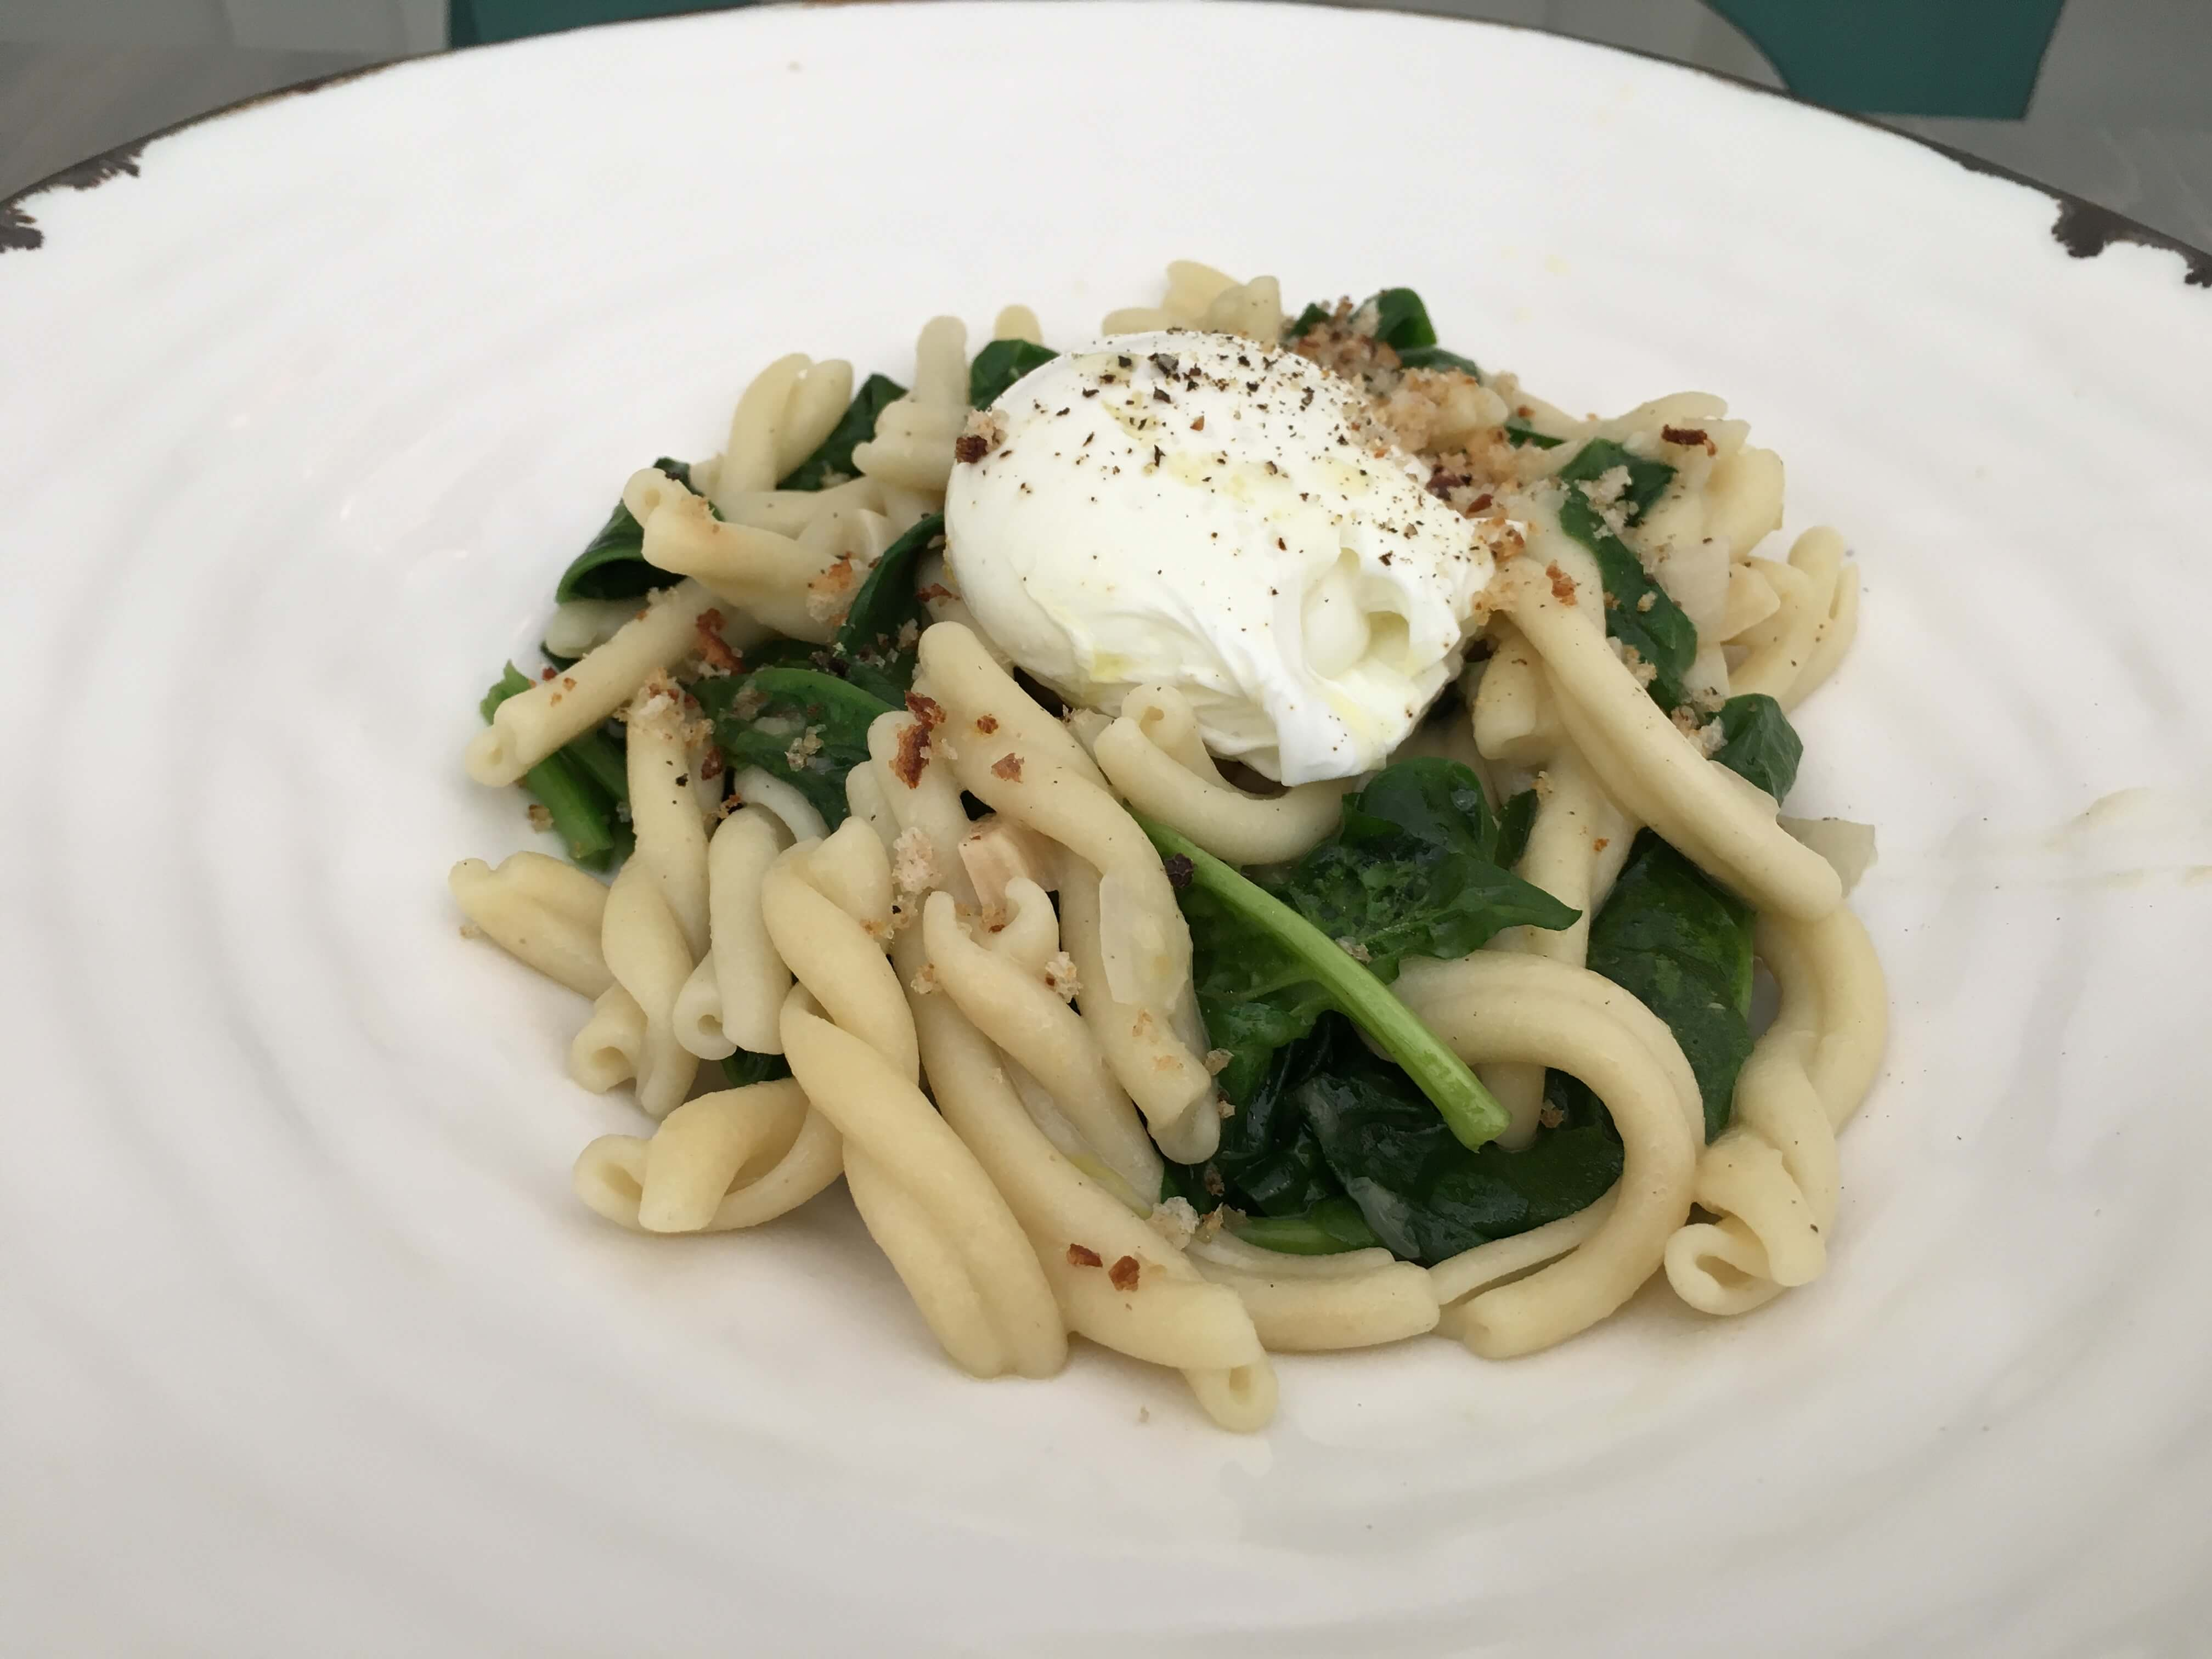 Pate Artisanal. Strozzepetti pasta, soft poached organic duck egg, spinach, shallot, lemon.